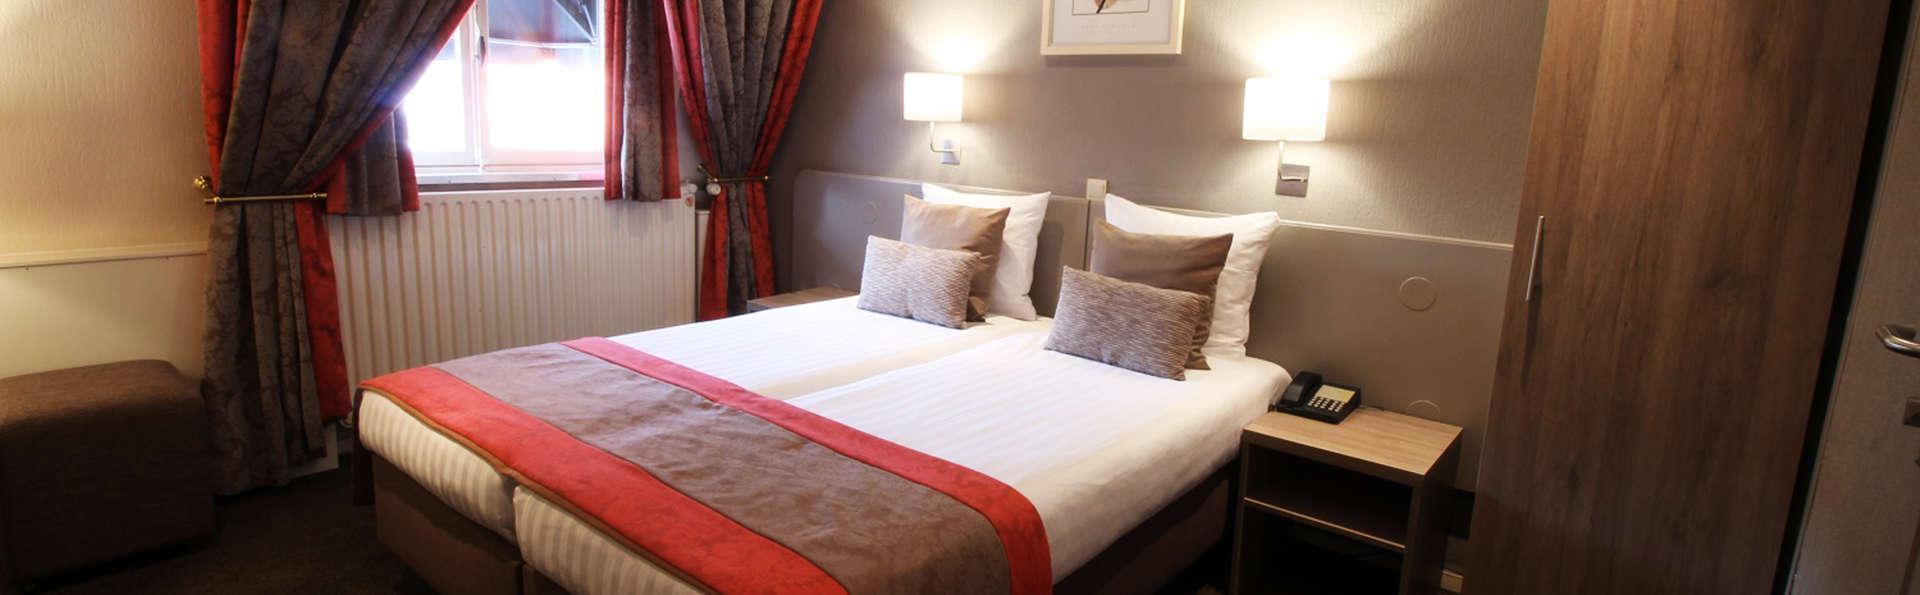 Hotel Hulsman - EDIT_room5.jpg